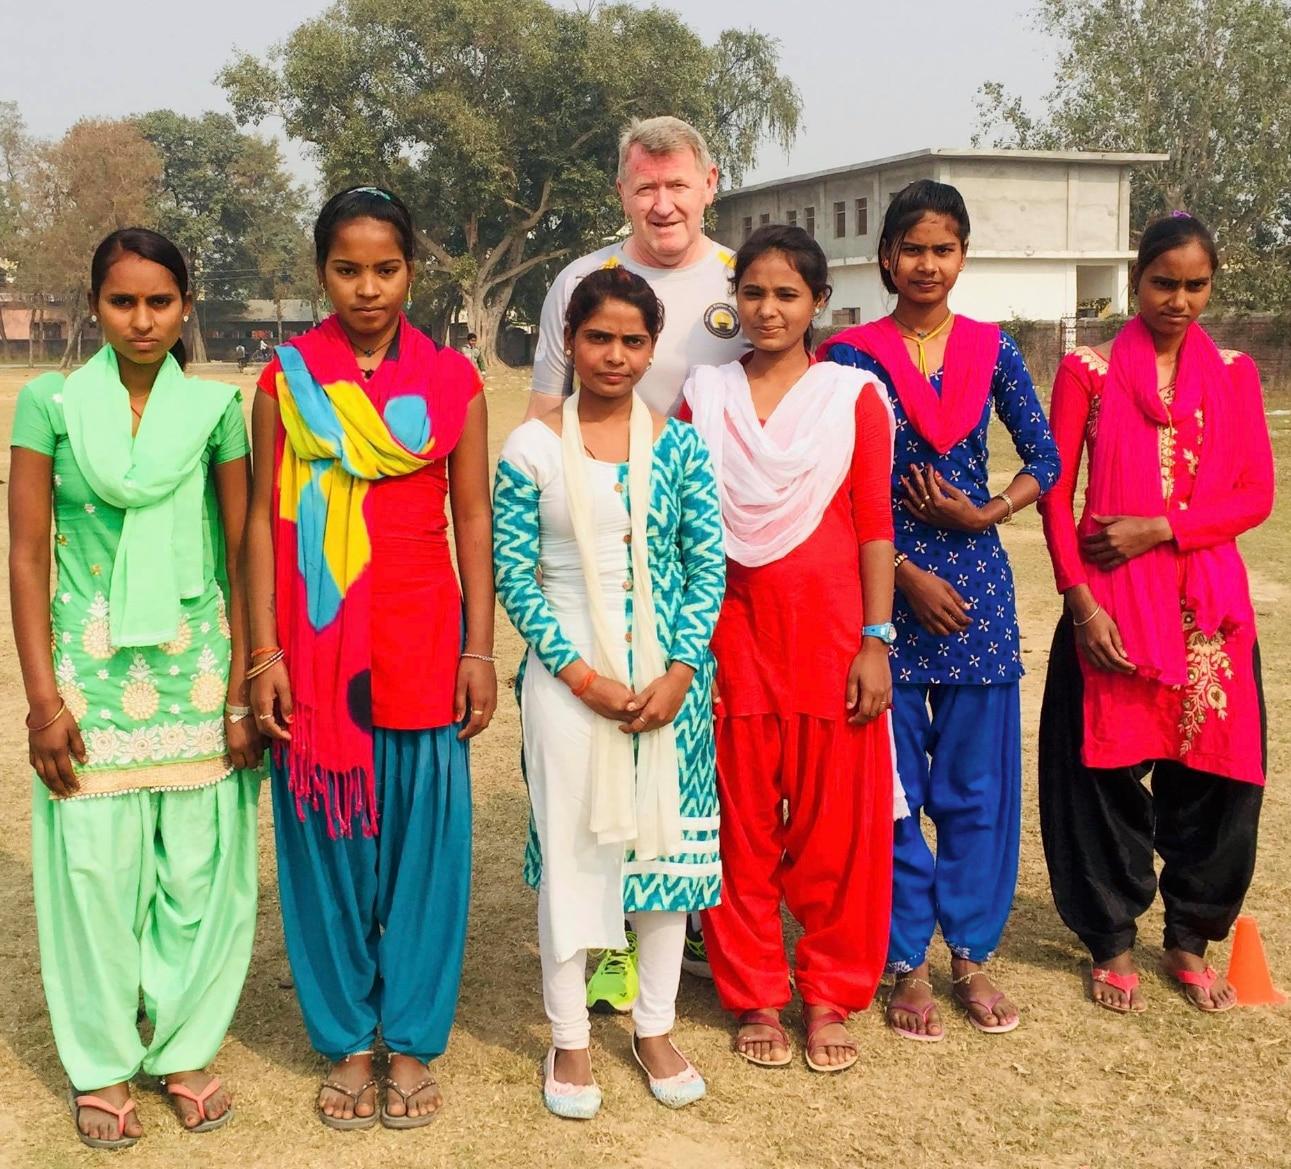 Steve Roberts, Australian, Nepal